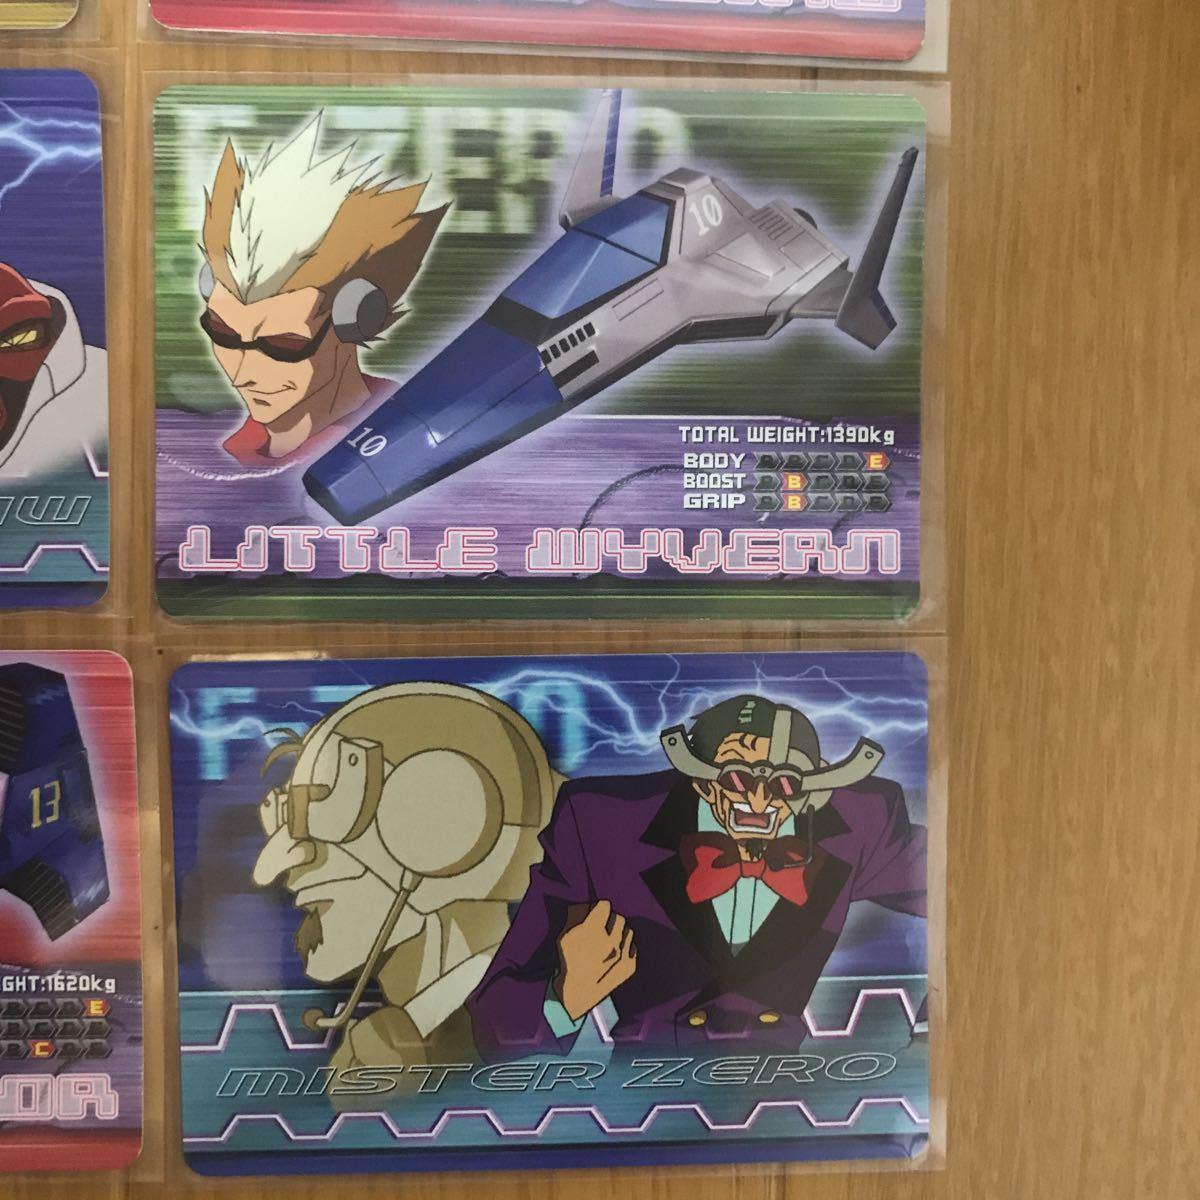 GBA  F-ZERO ファルコン伝説 &【希少】7枚 カードダス版 2枚有り☆ファルコン伝説カードe+ トレカ カード 任天堂 キャプテンファルコン_画像5